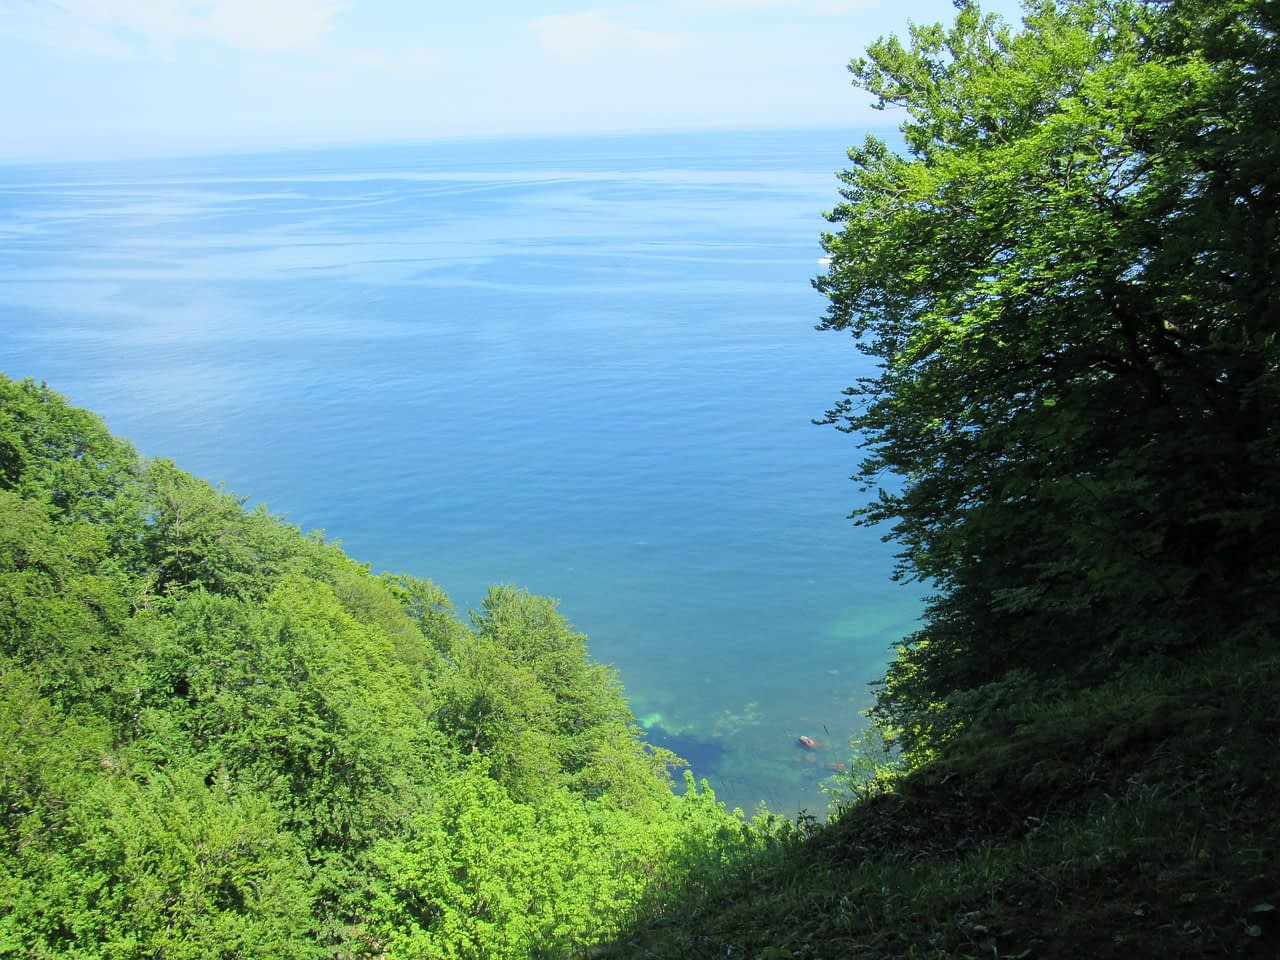 R%C%BCgen Island Vacations Sea Lake  - Liz14 / Pixabay